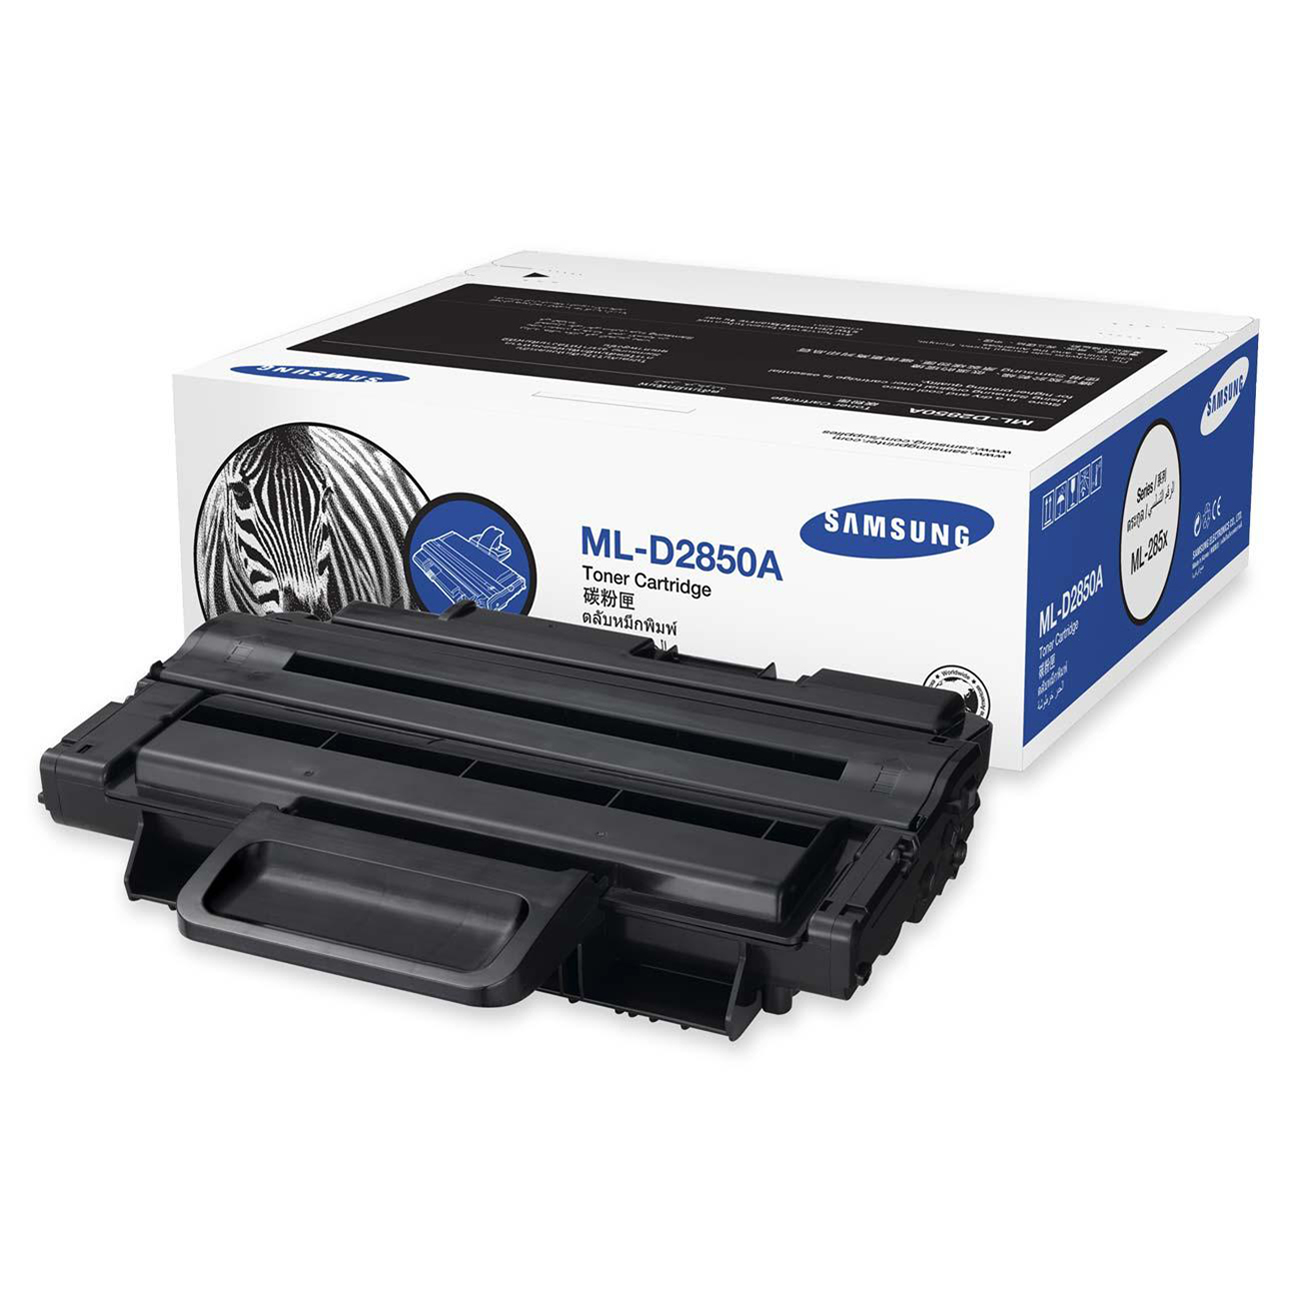 Samsung D2850 Black Toner Cartridge (Original)